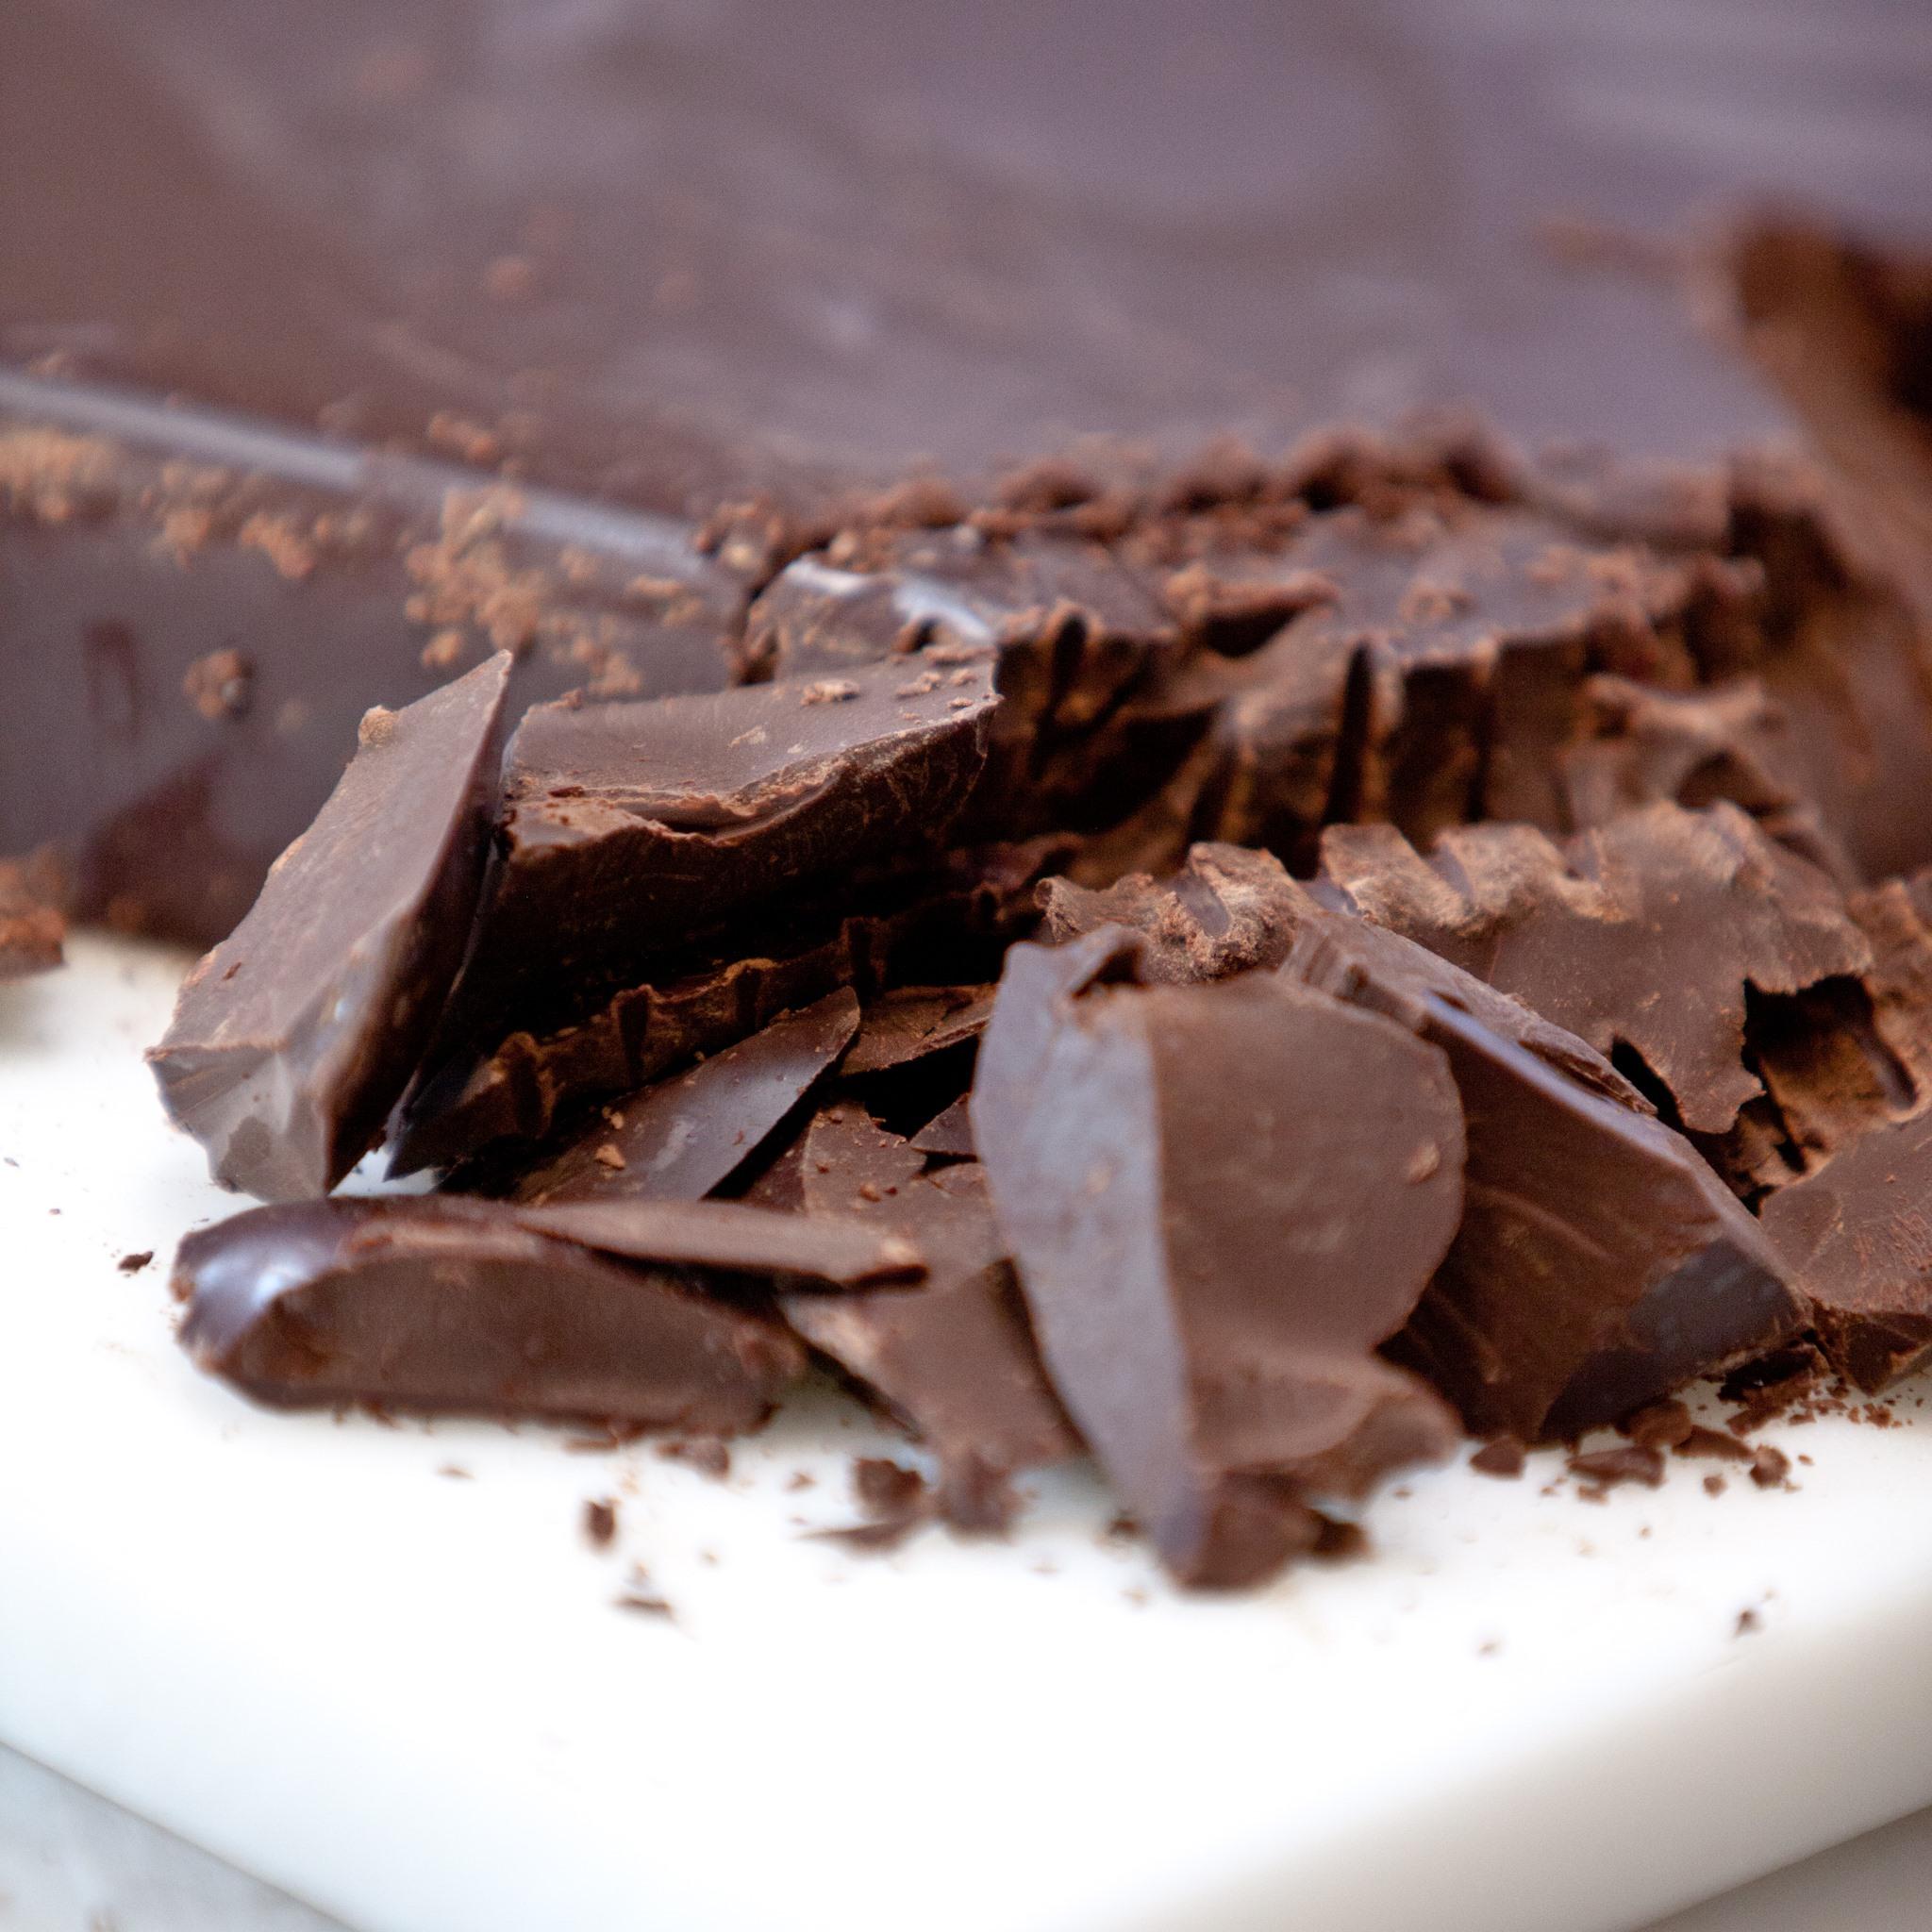 Mmmmm...chocolate. Real chocolate. Need I say more? Image Courtesy: creochocolate.com